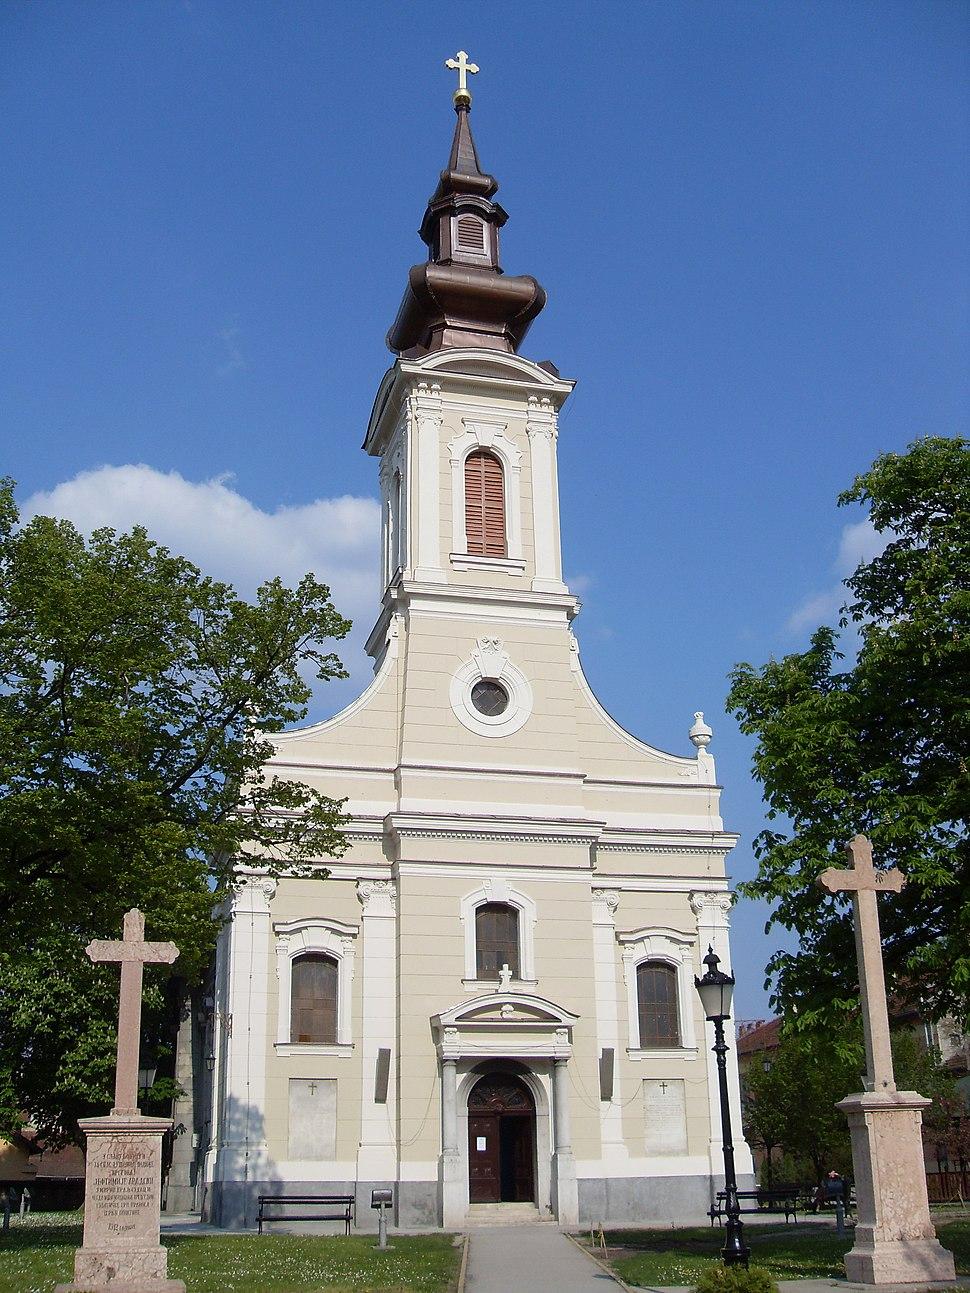 Српска православна црква Вазнесења Господњег